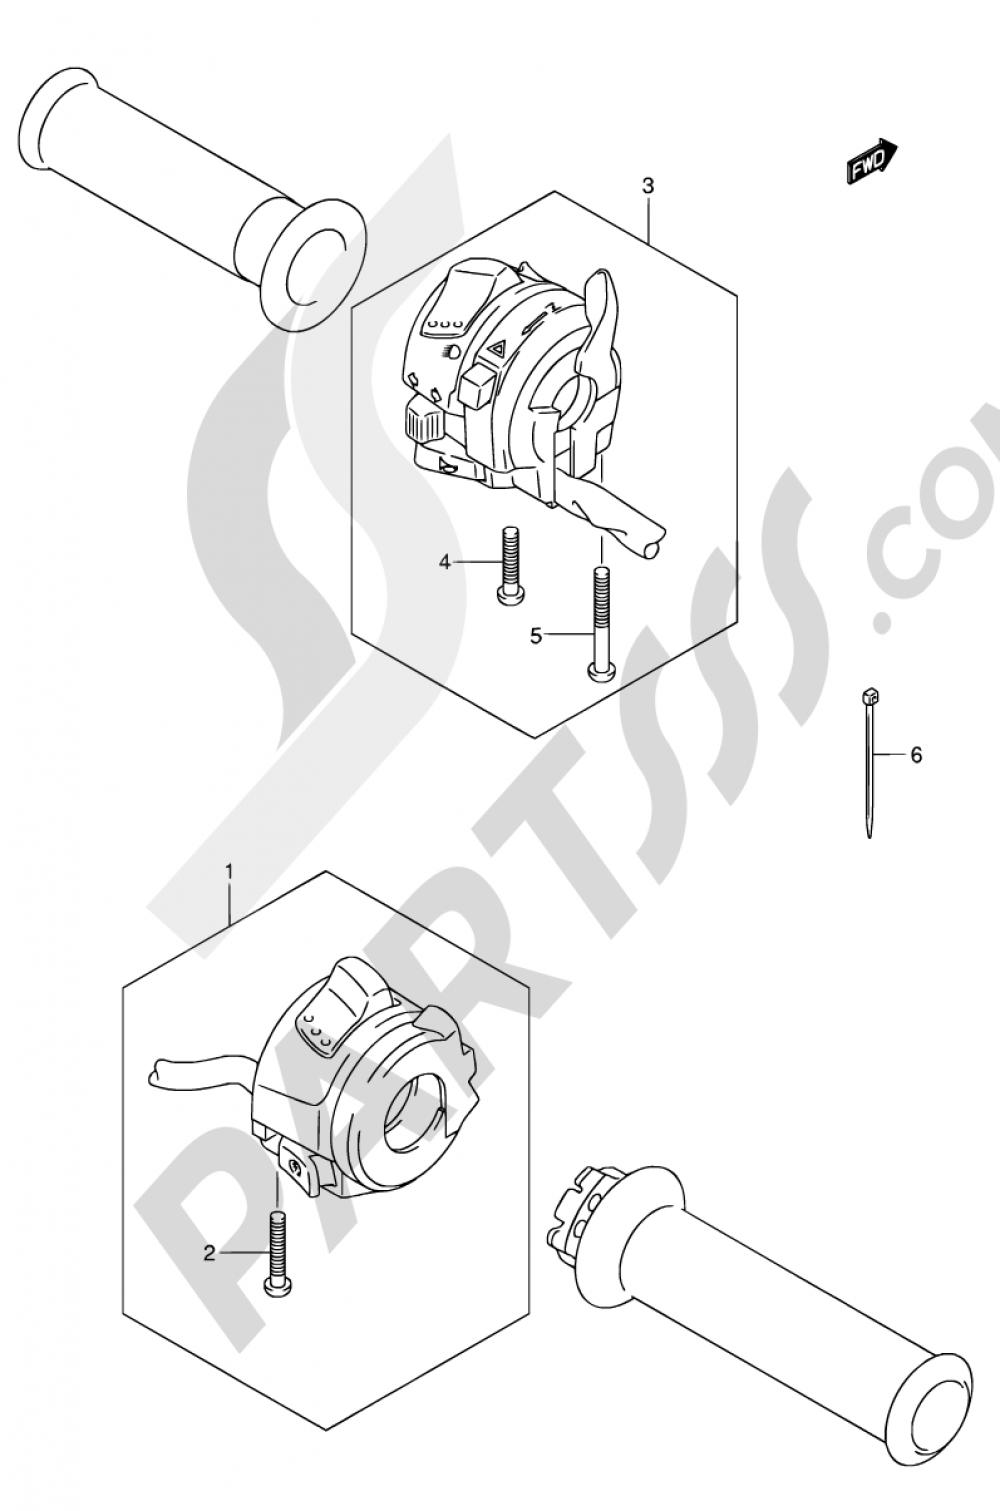 35 - HANDLE SWITCH Suzuki BANDIT GSF650SA 2005